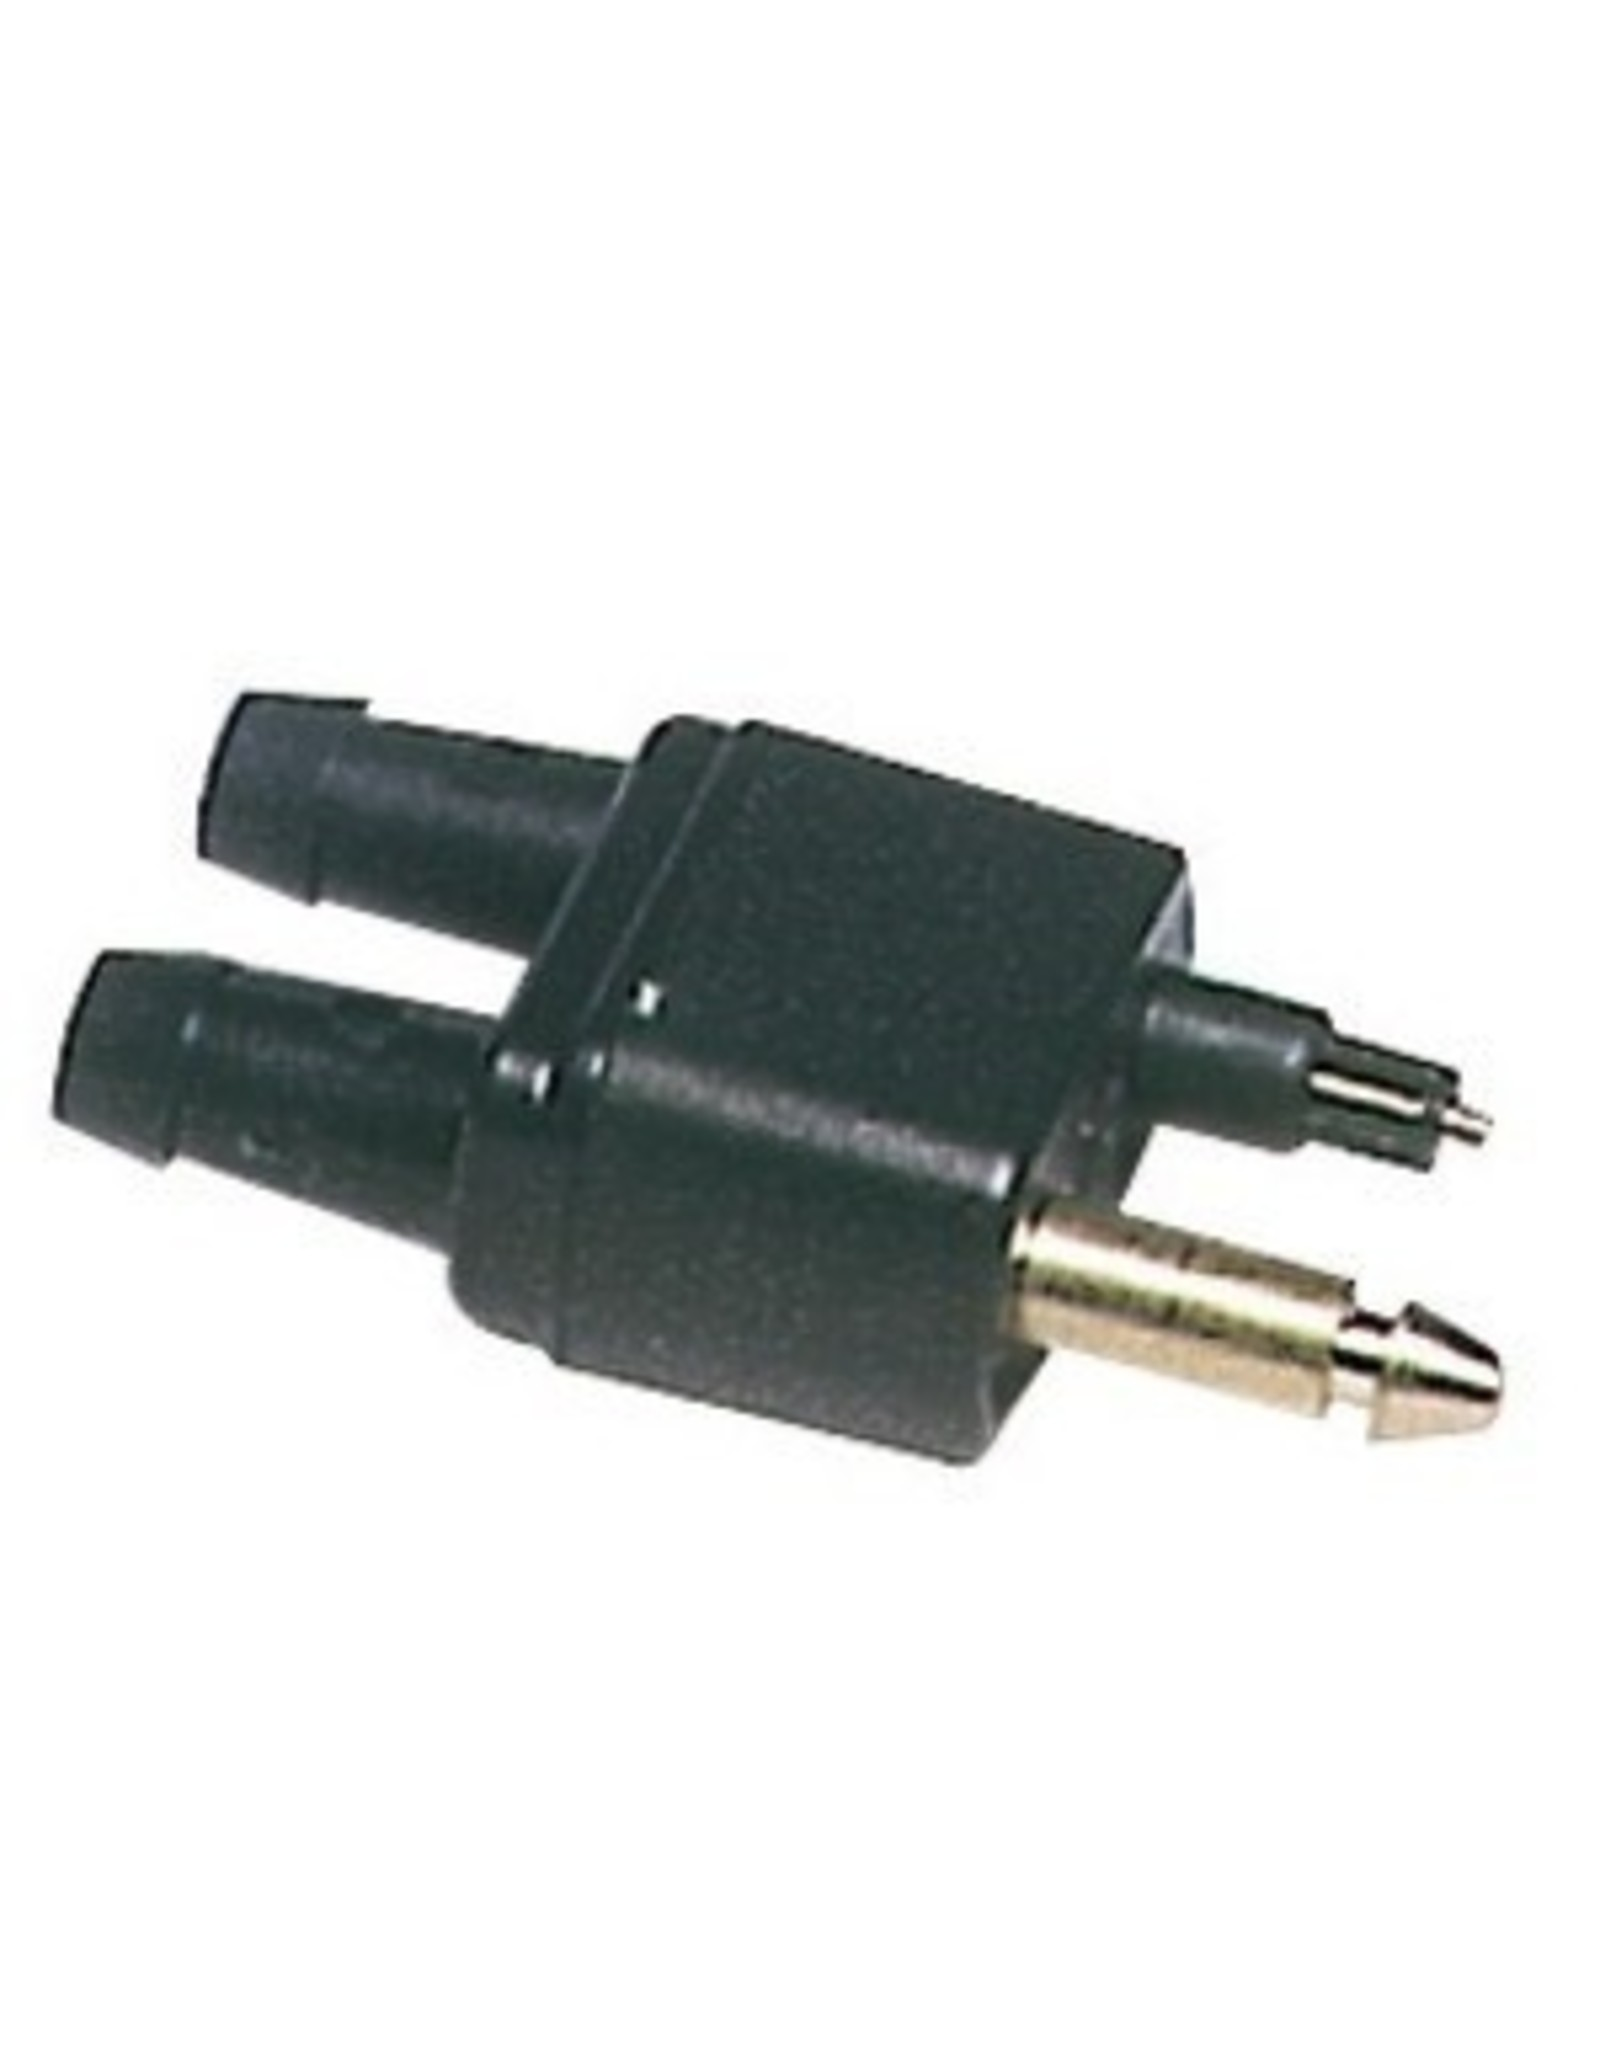 Osculati Yamaha benzine connector los